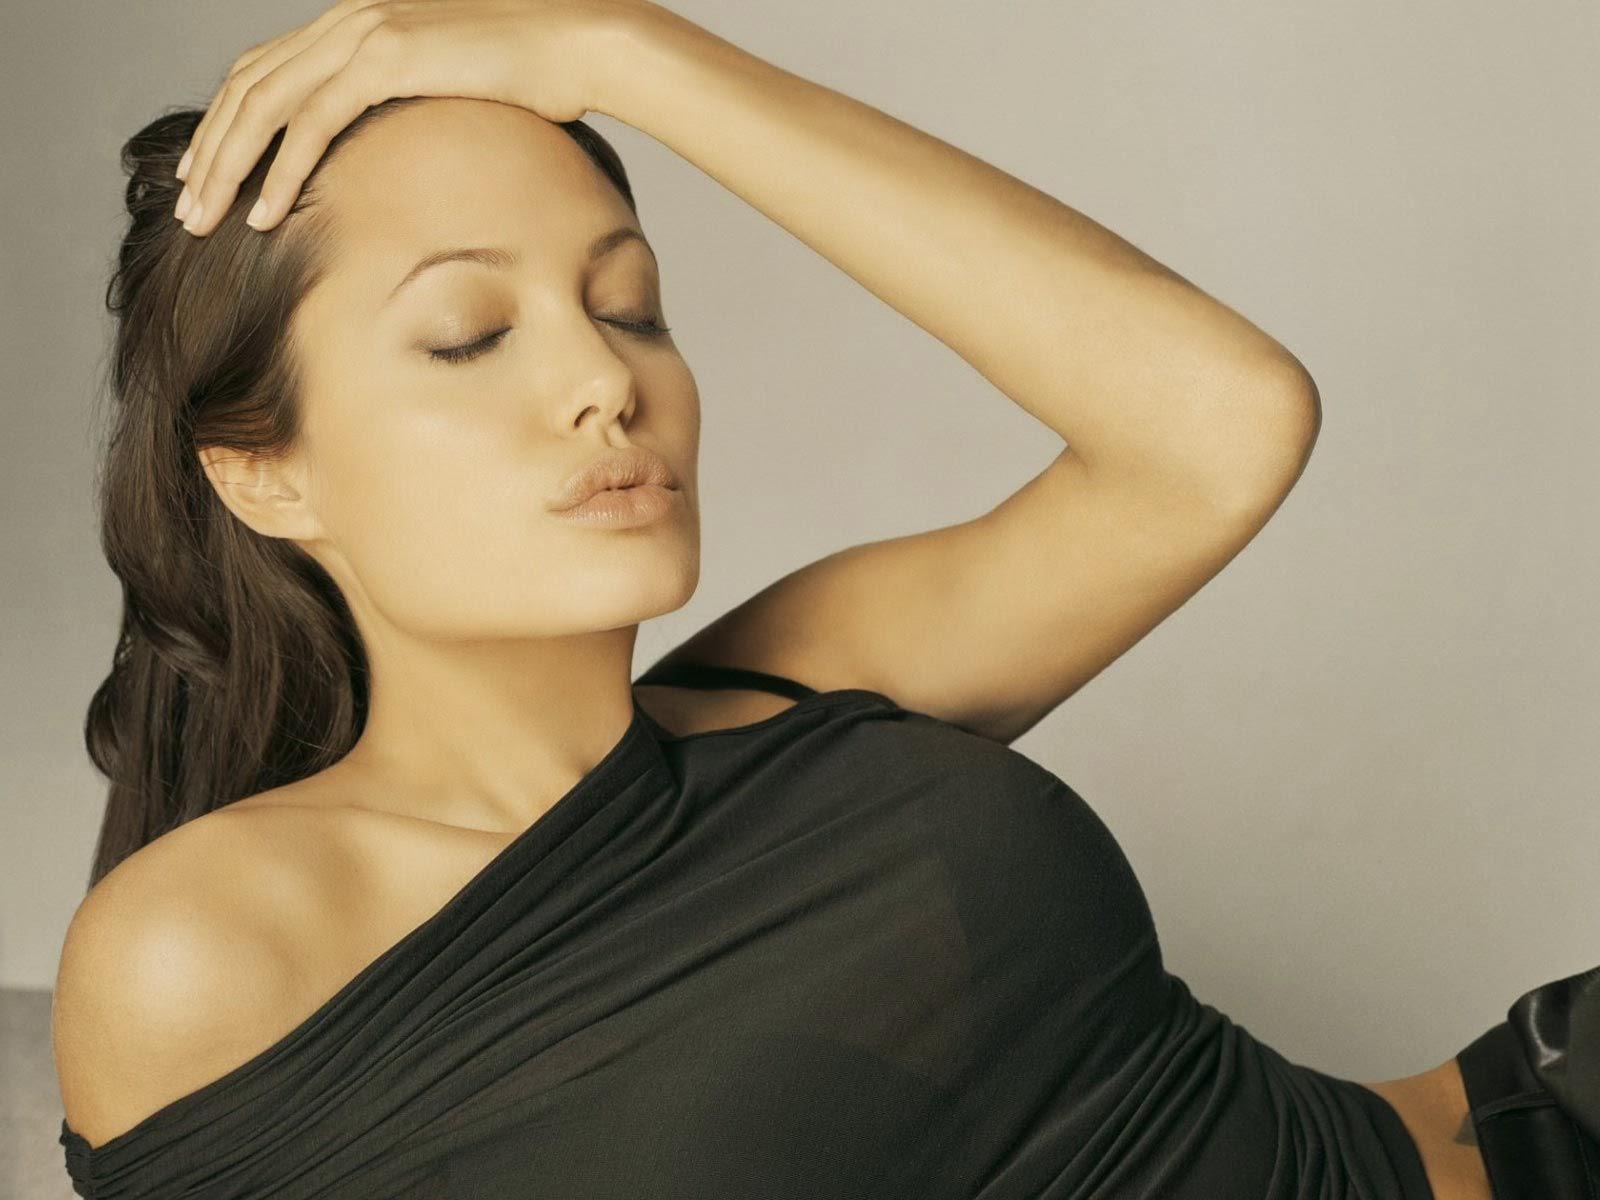 Angelina Jolie Hot Stills atoz hotphotos: angelina-jolie hot stills